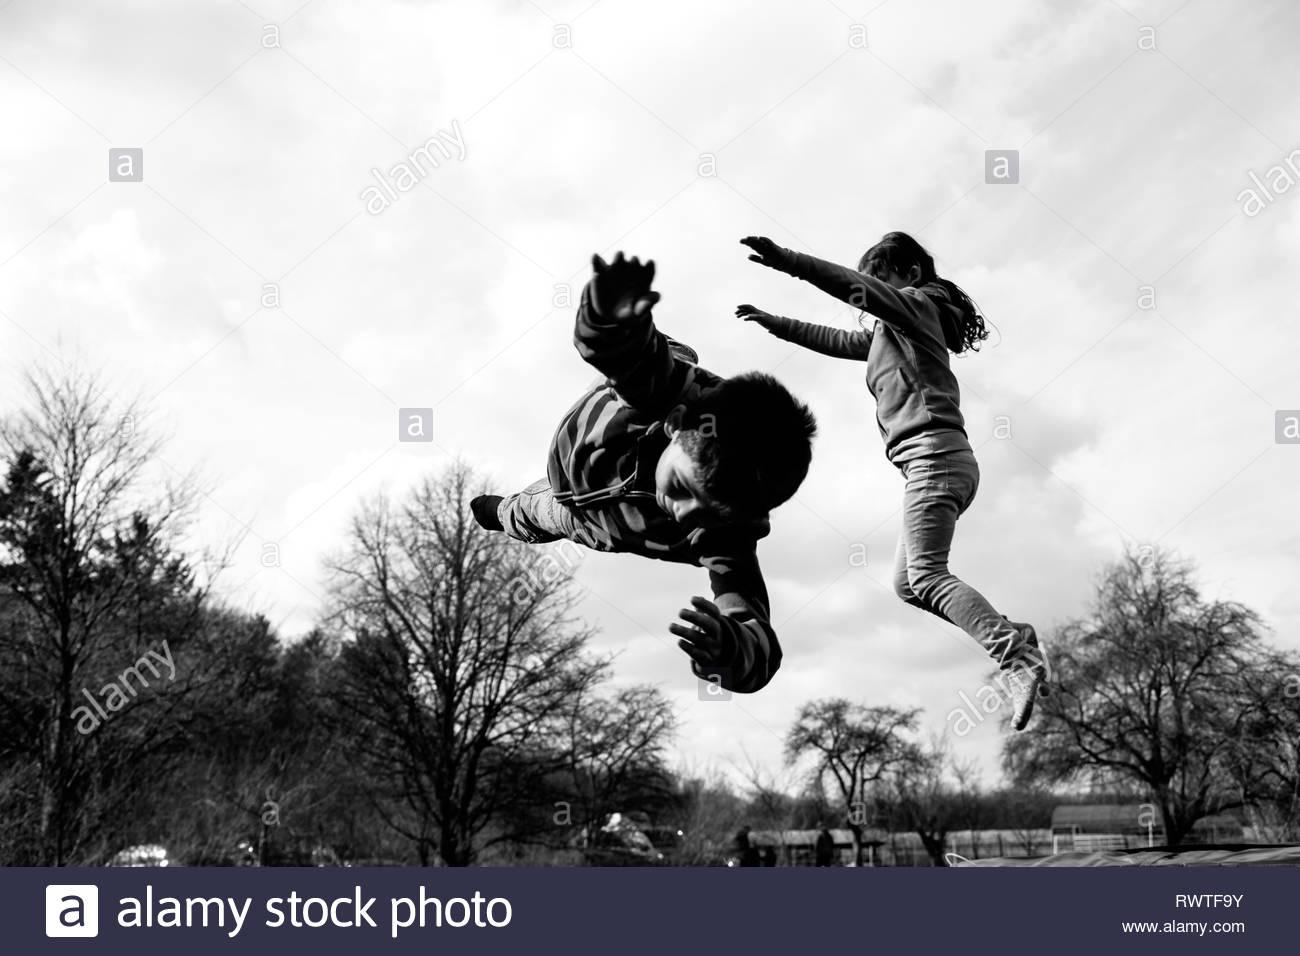 Kids Trampoline, joy - Stock Image